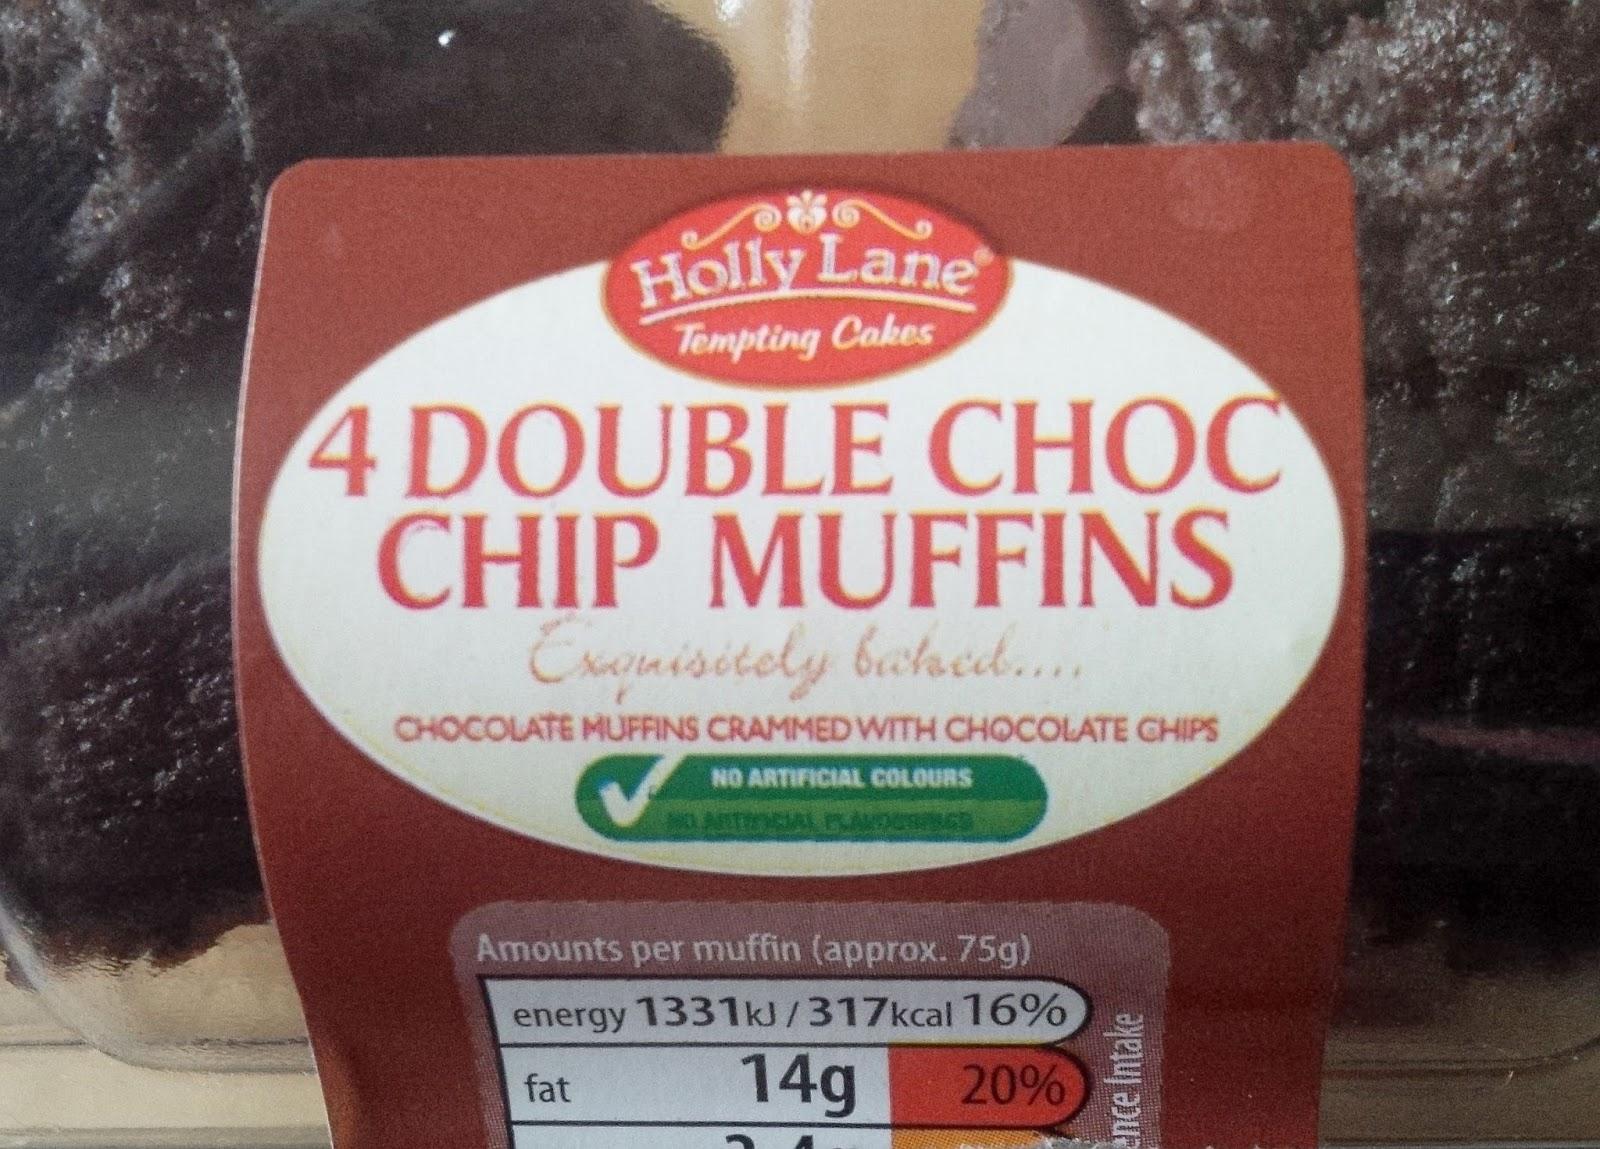 Aldi Tasted: Aldi Holly Lane Double Choc Chip Muffins